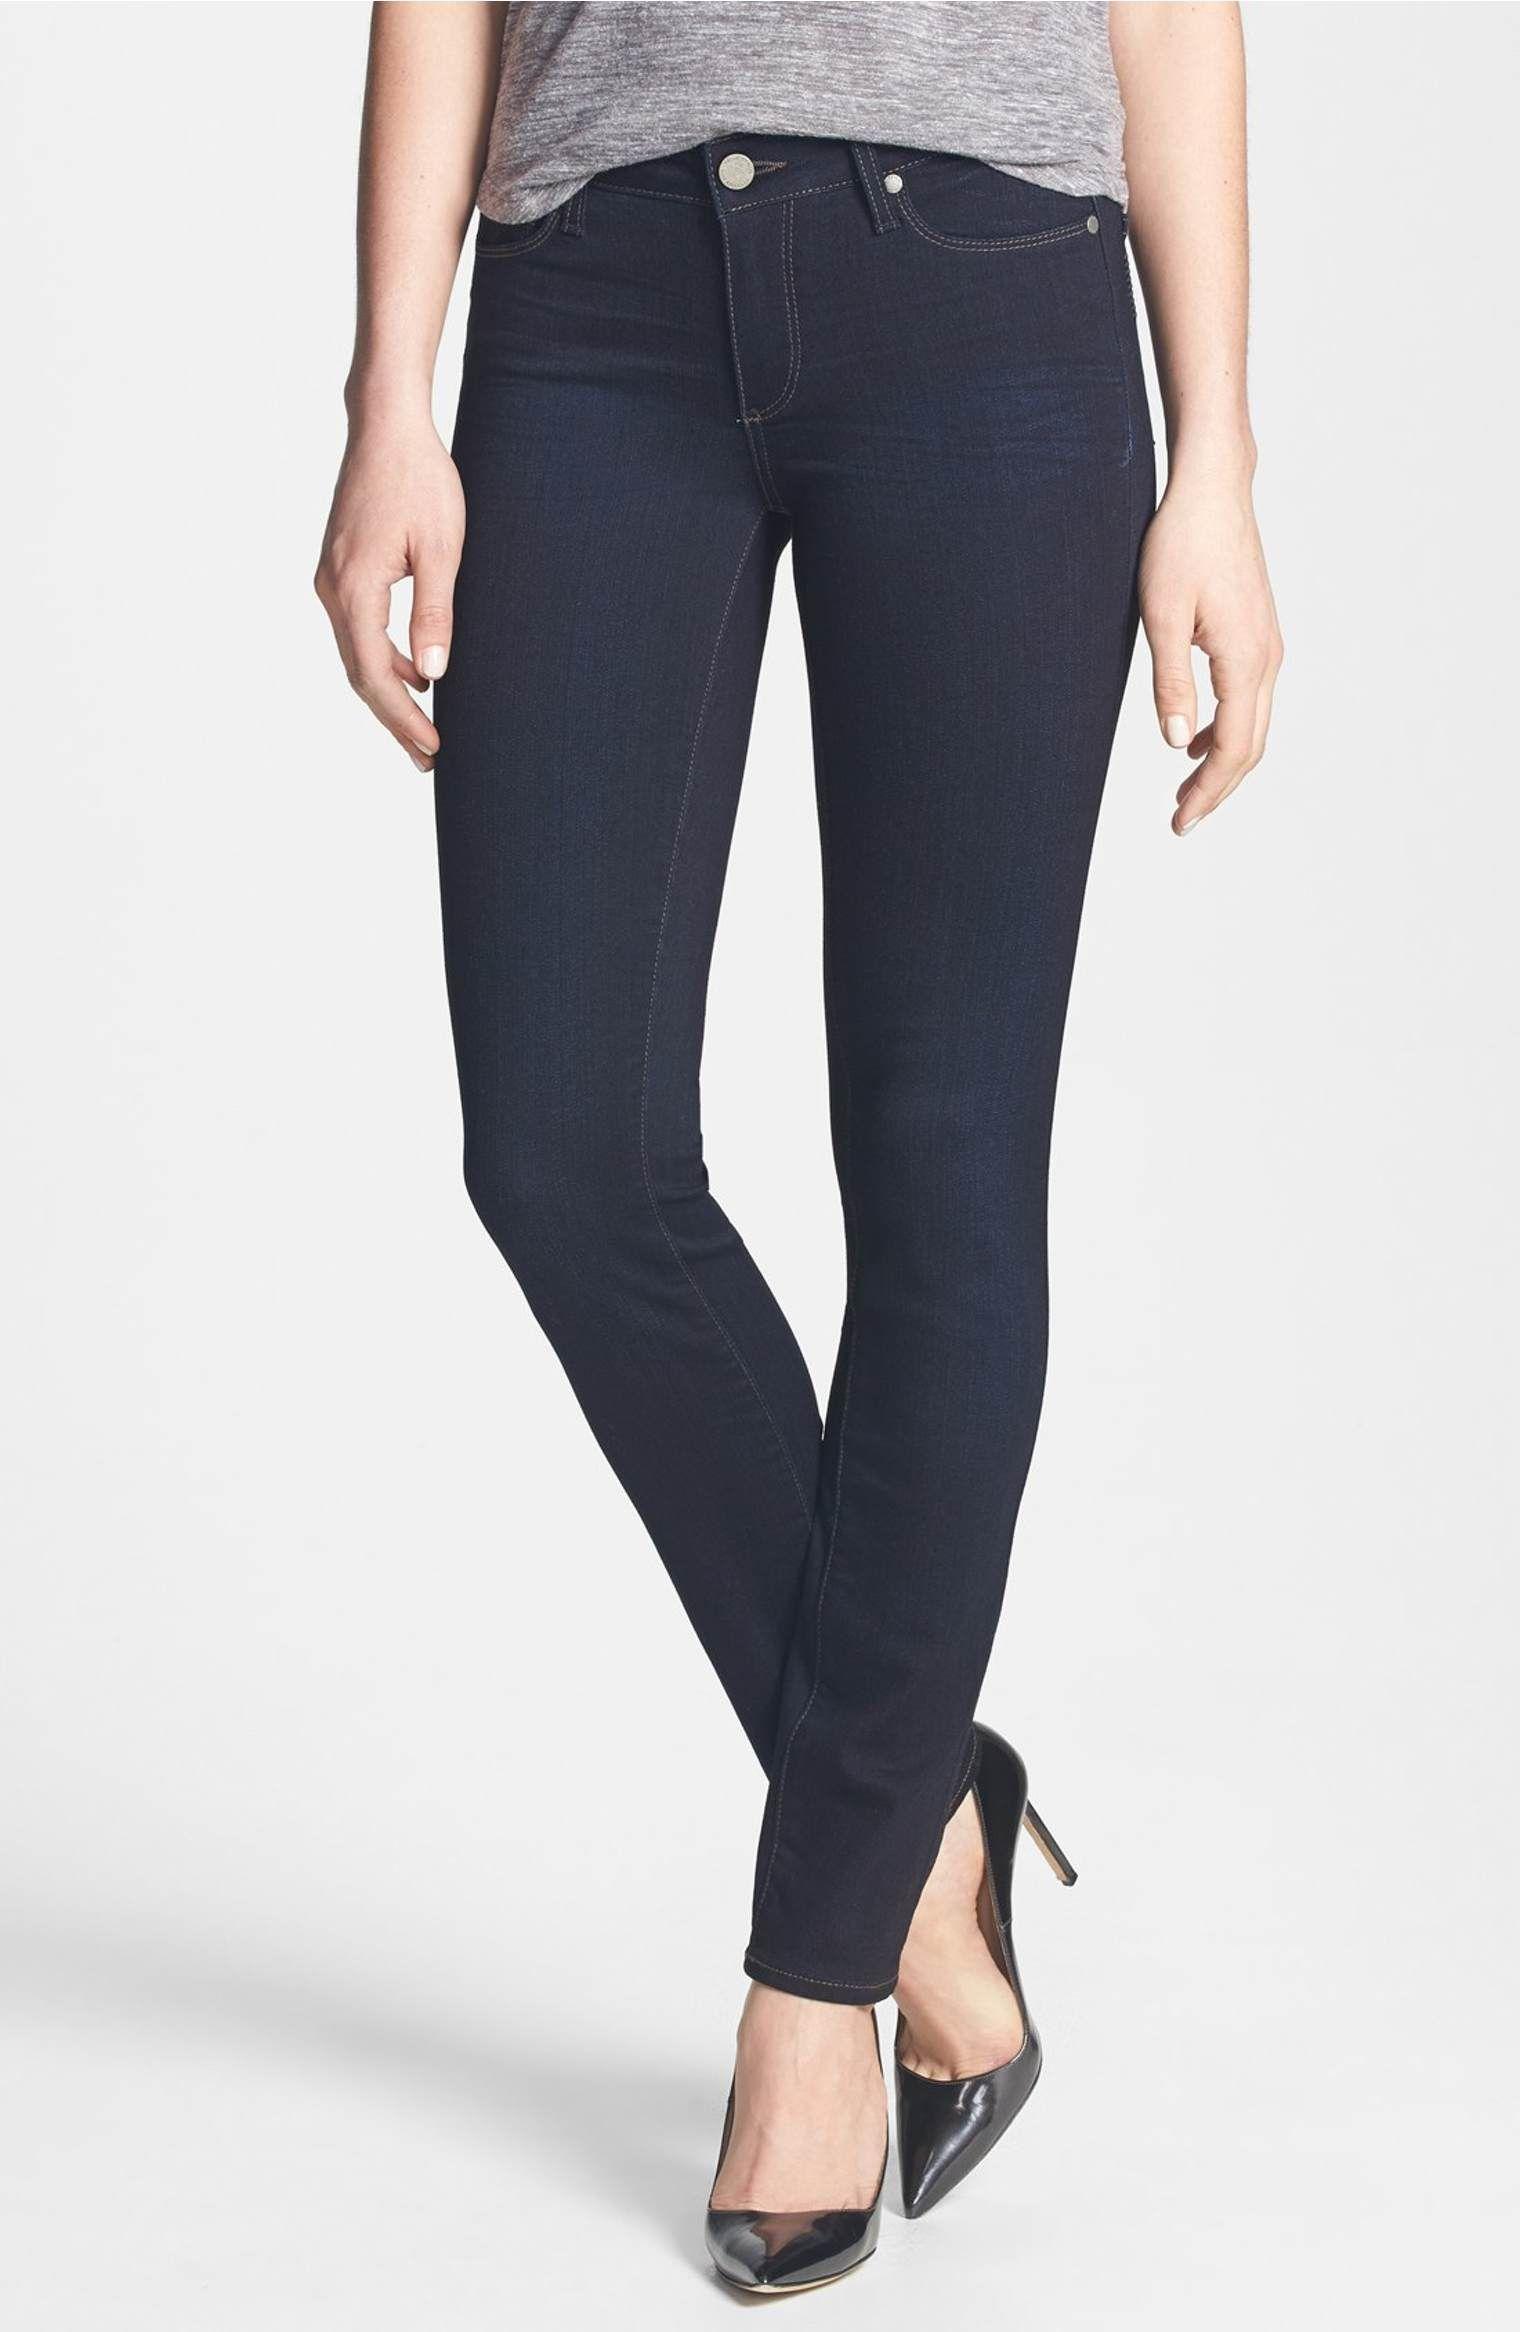 Paige mona Skinny Skyline' Jeans Image Main 'transcend PYqgg5